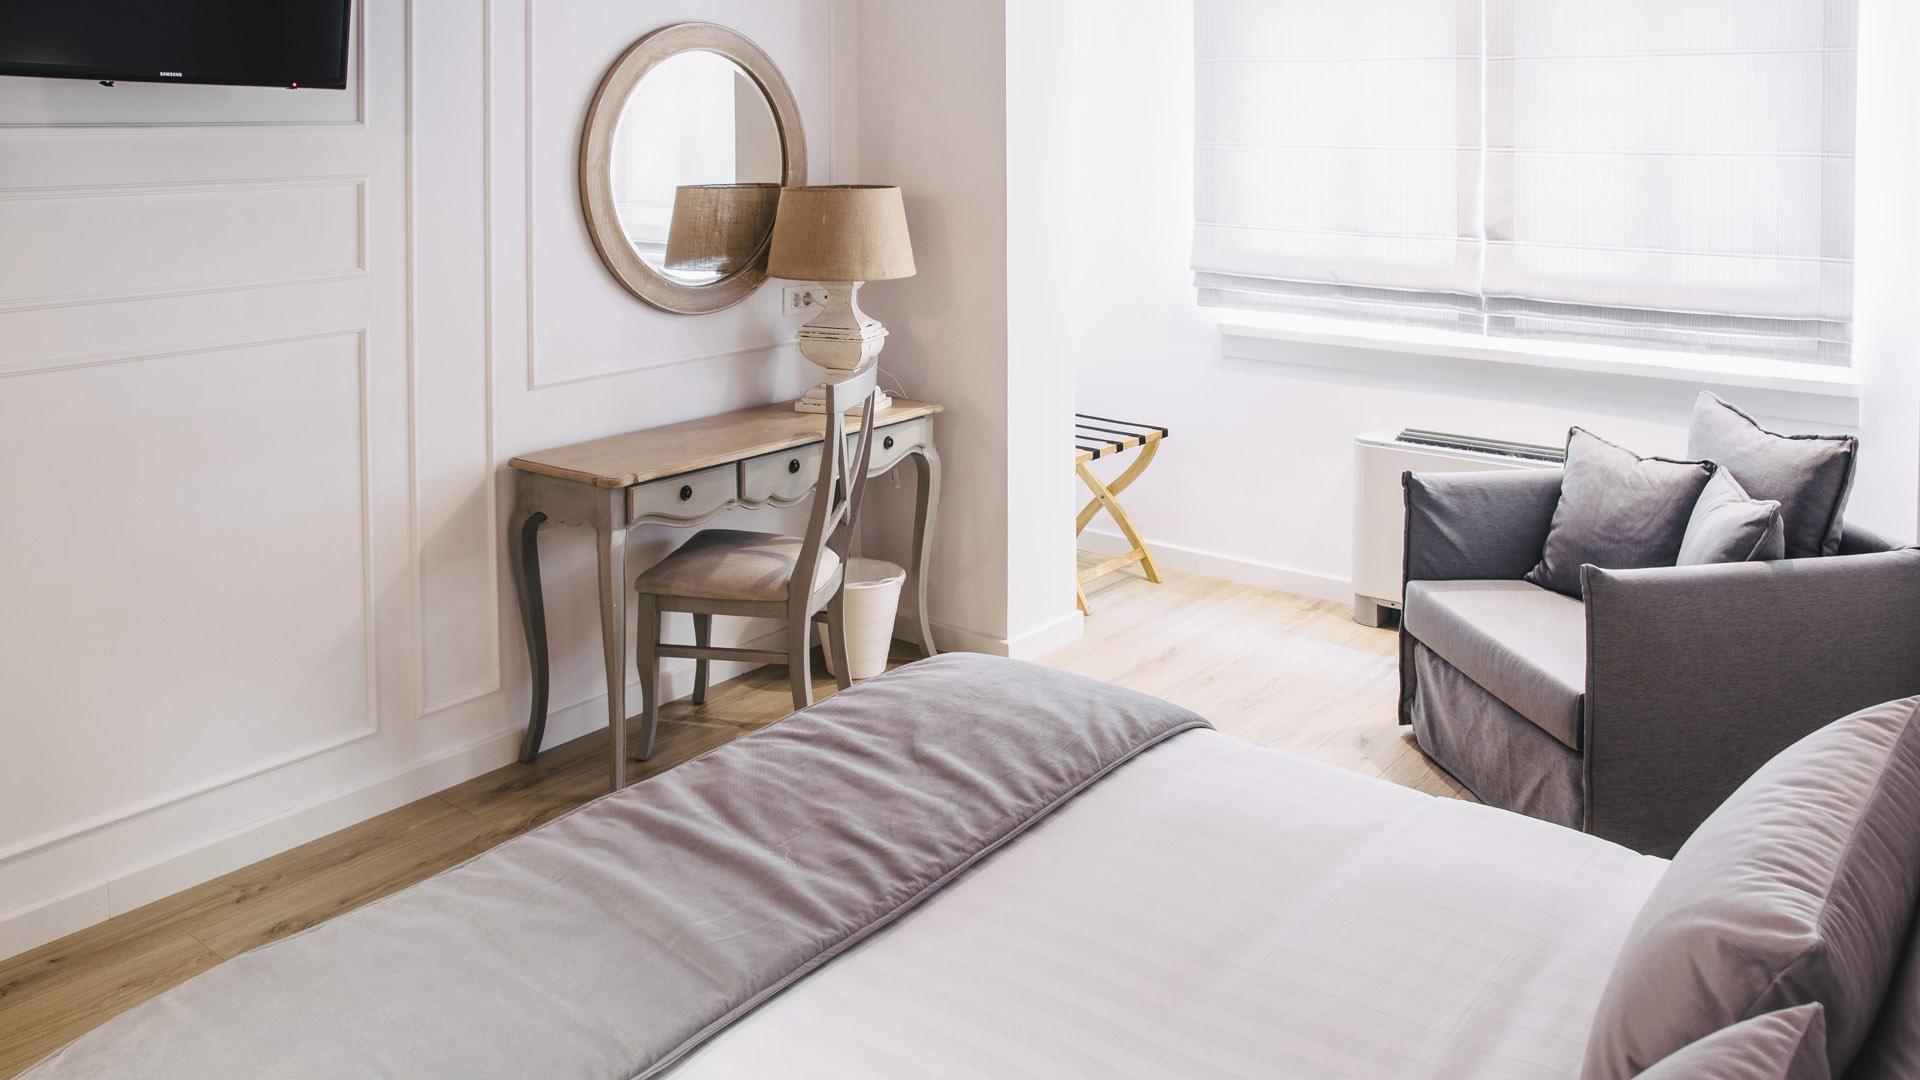 http://itskale-hotel.gr/demo/wp-content/uploads/2013/10/DSC_6175.jpg